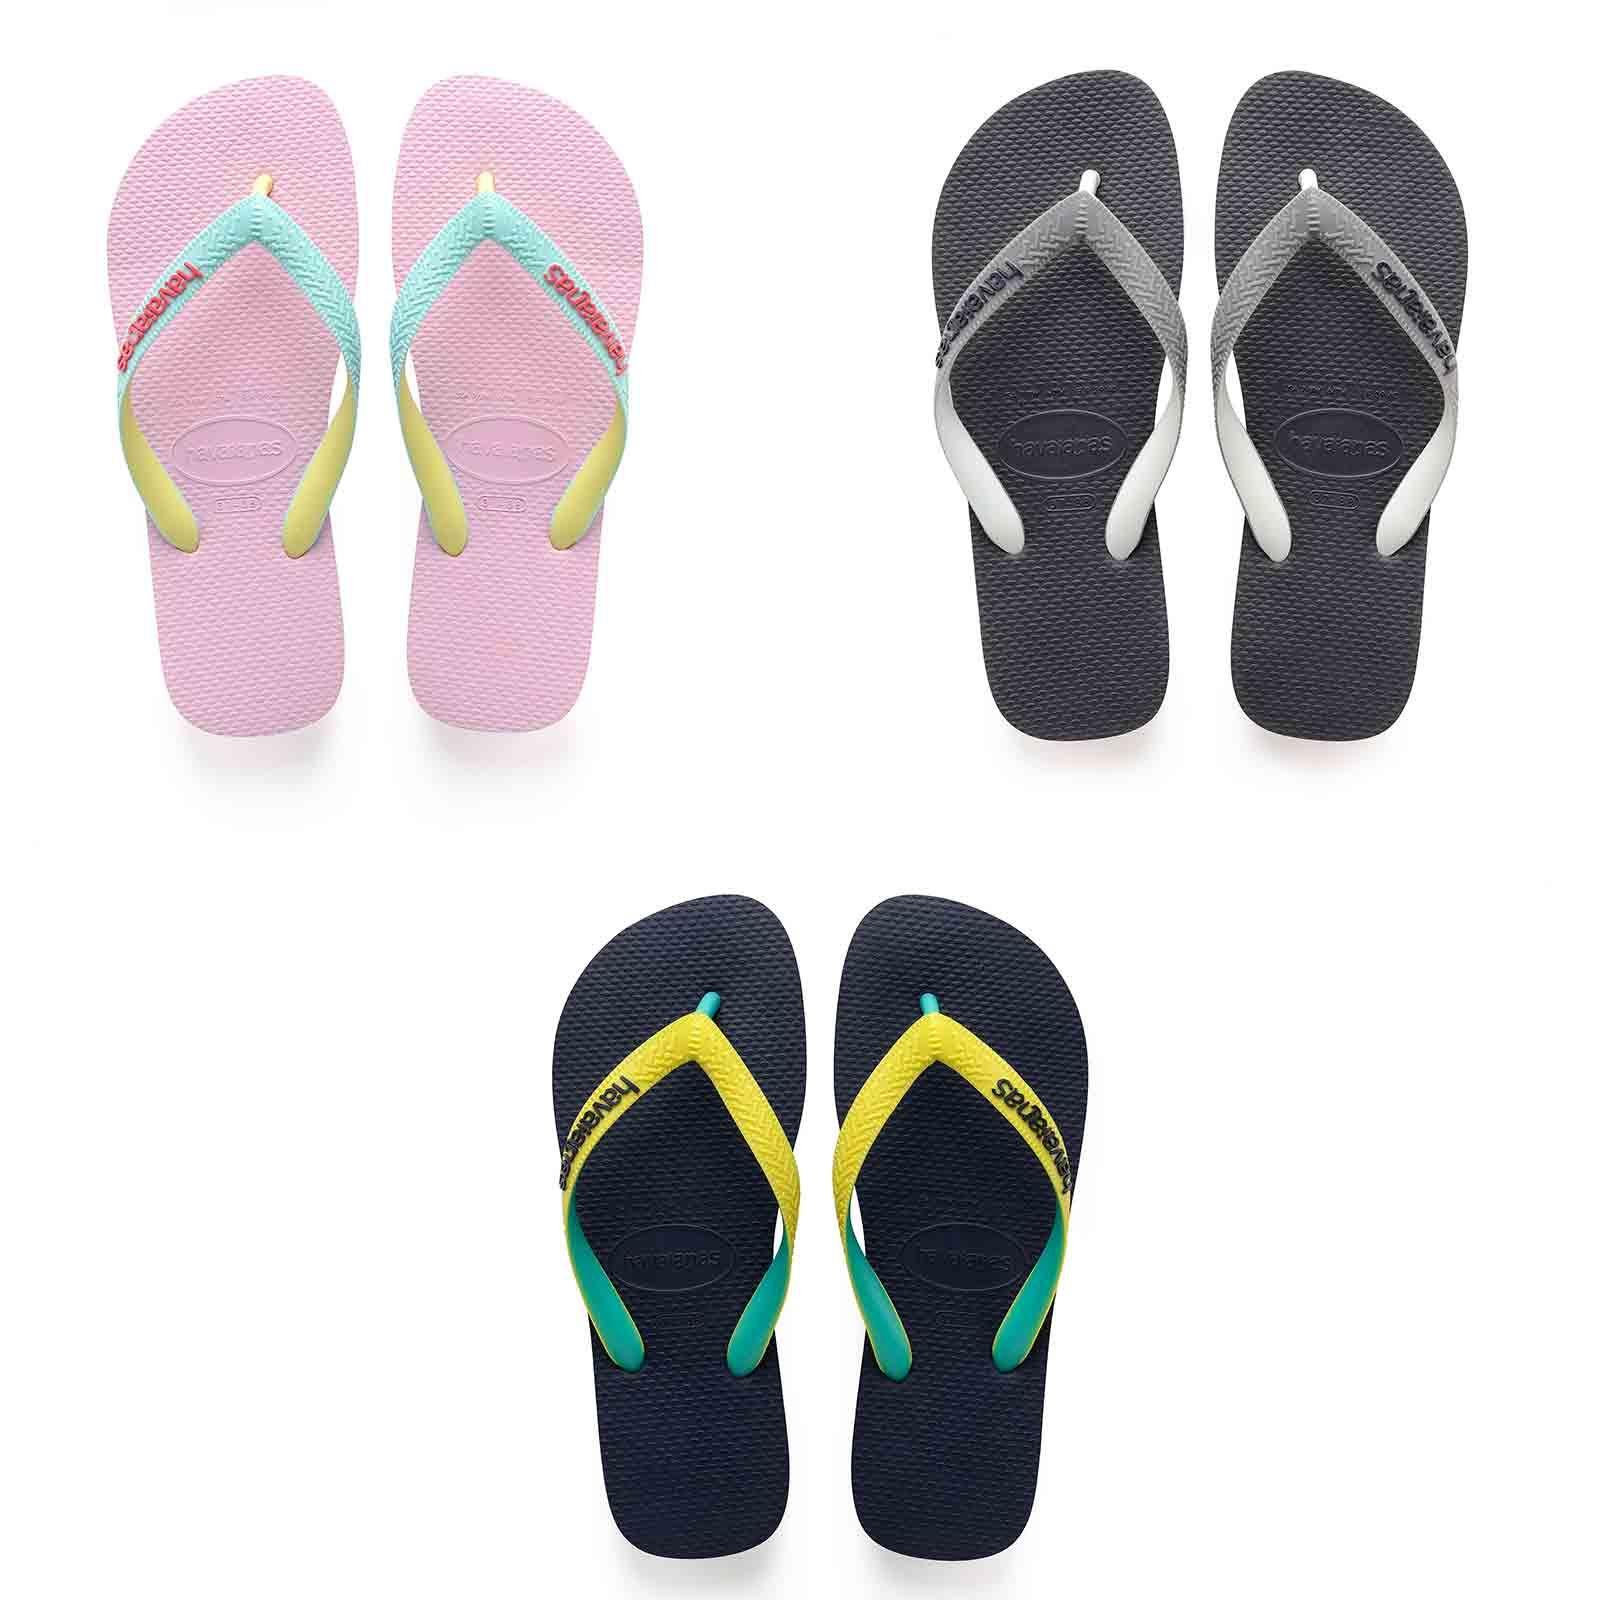 aba8beadb Details about Havaianas Top Mix Flip Flops Summer Beach Pool Sandals in Grey